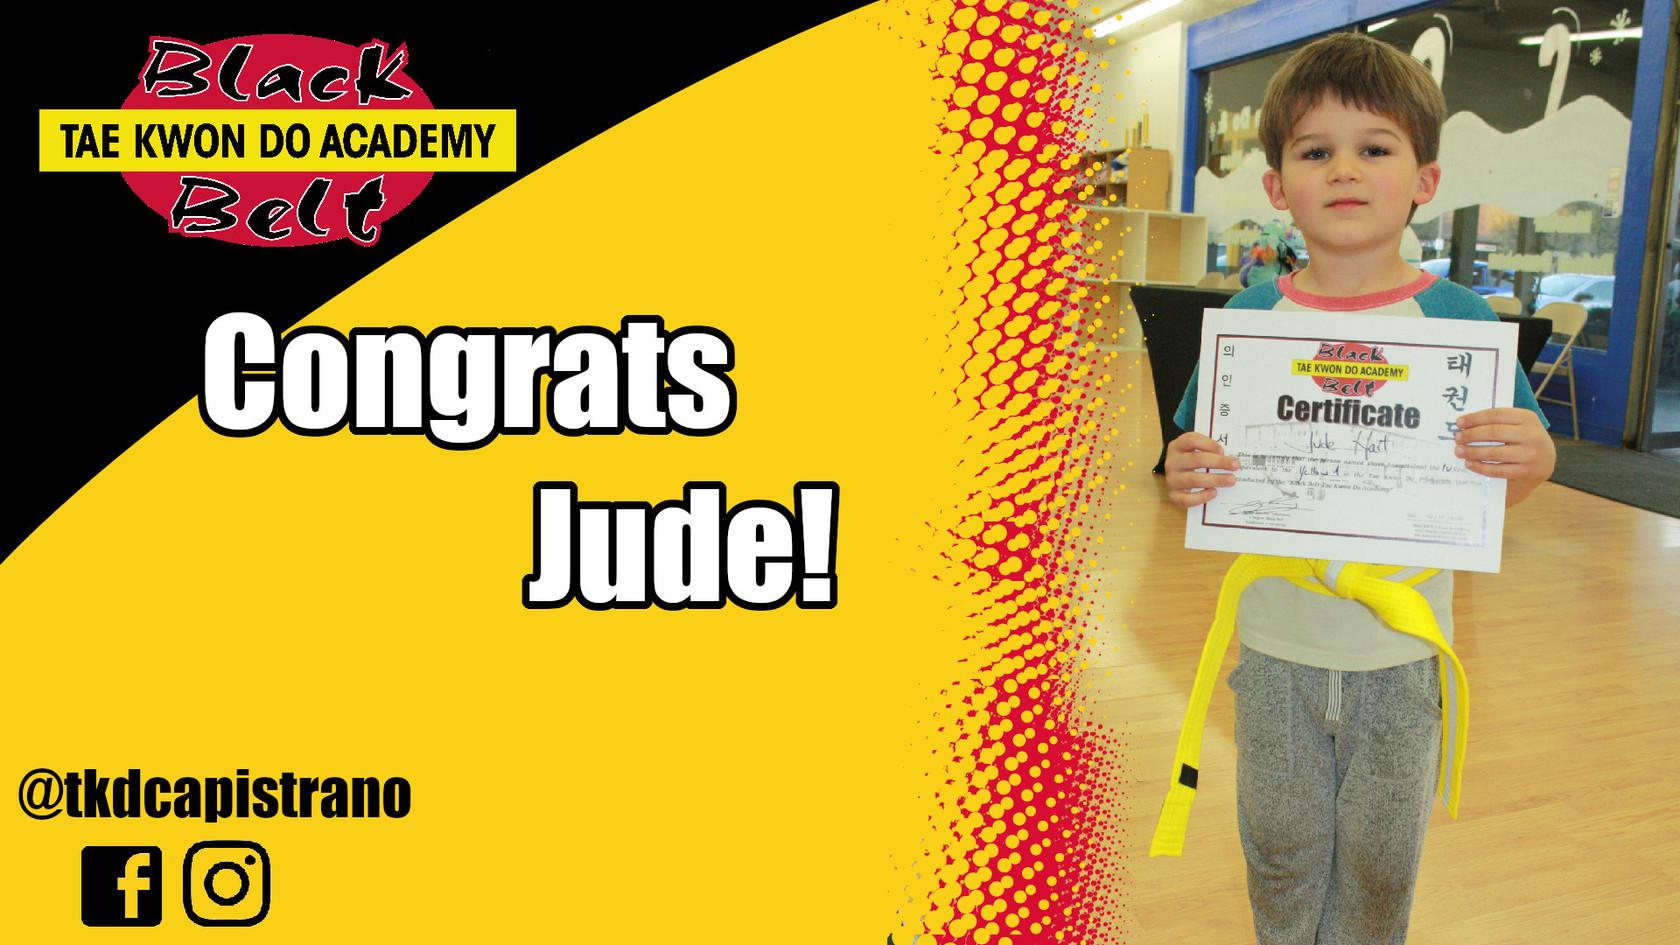 Congrats Jude!